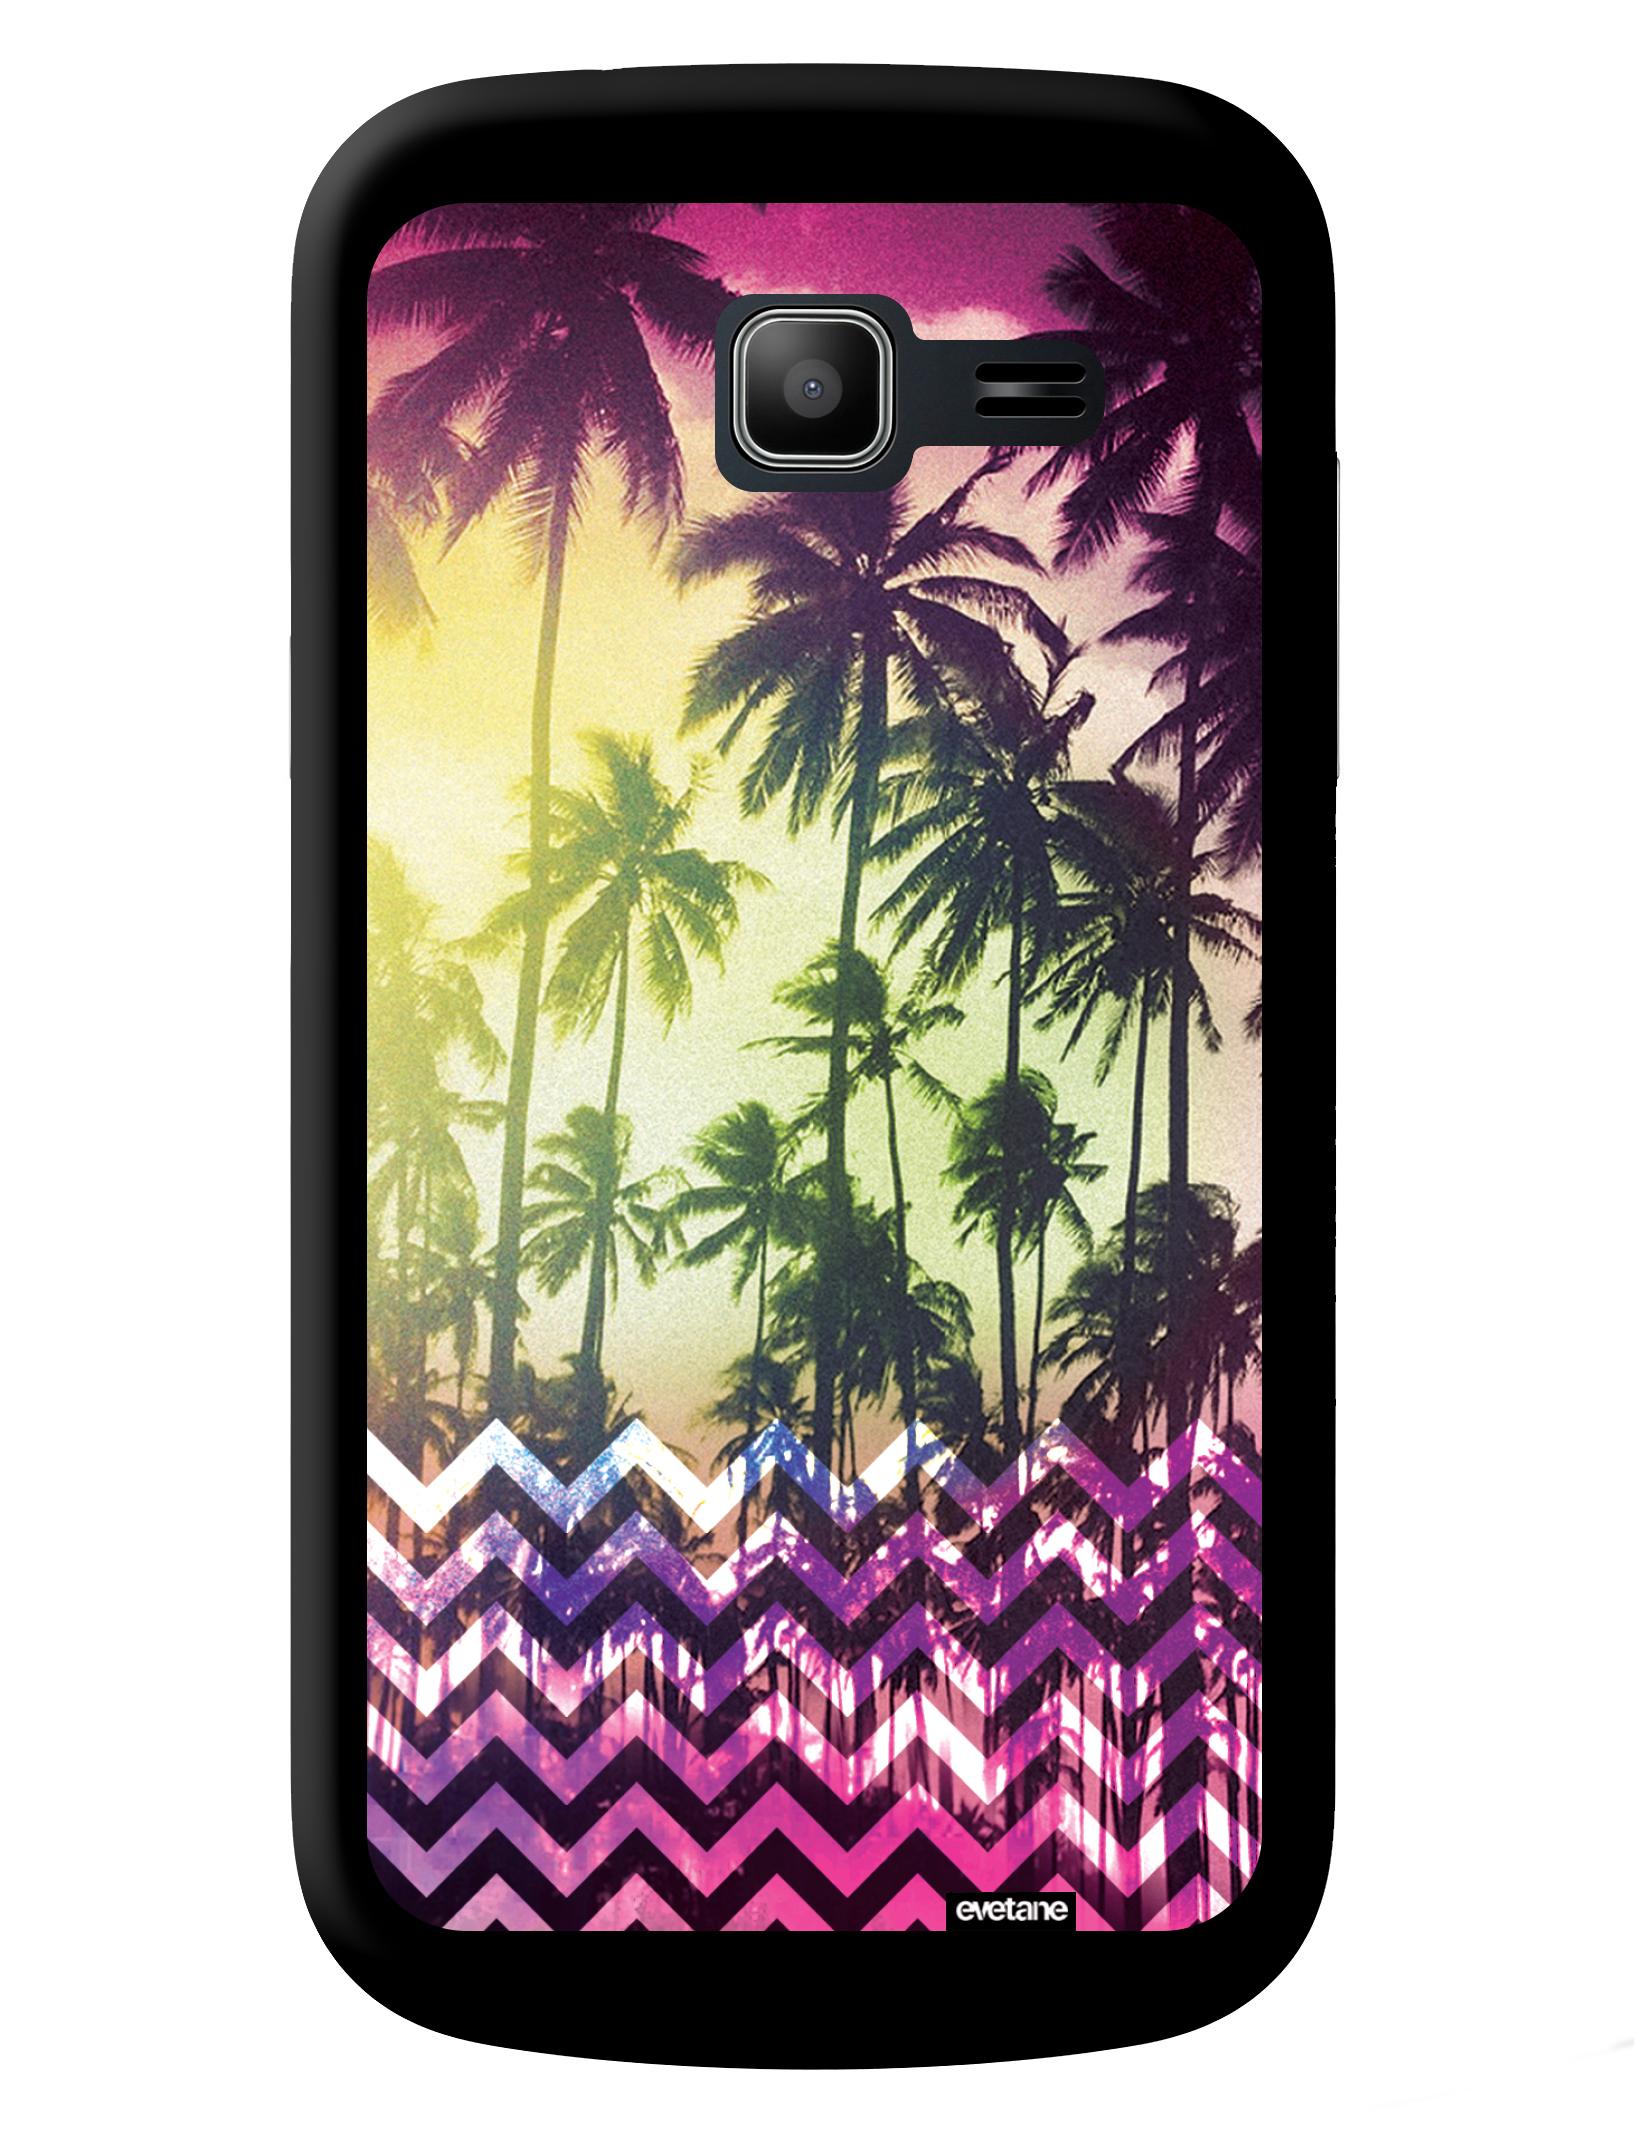 COQUEDISCOUNT Coque Palmiers pour Samsung Galaxy Trend Lite S7390